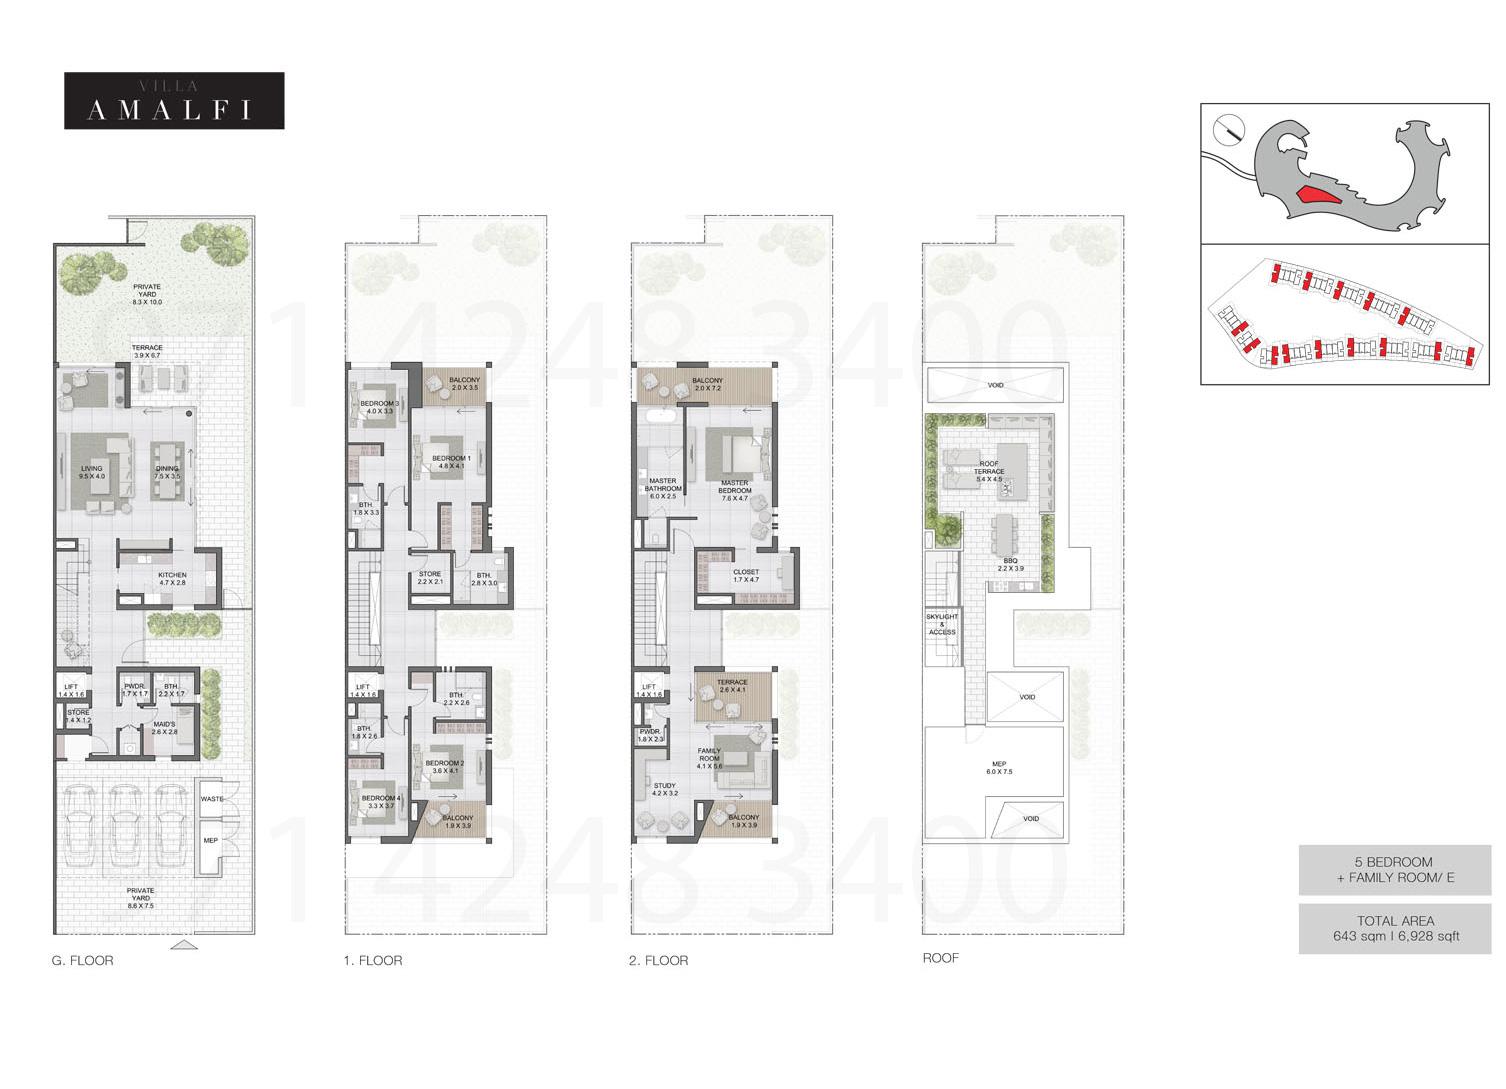 Bedroom 5 Villas, Sizes from 6,928 sq.ft